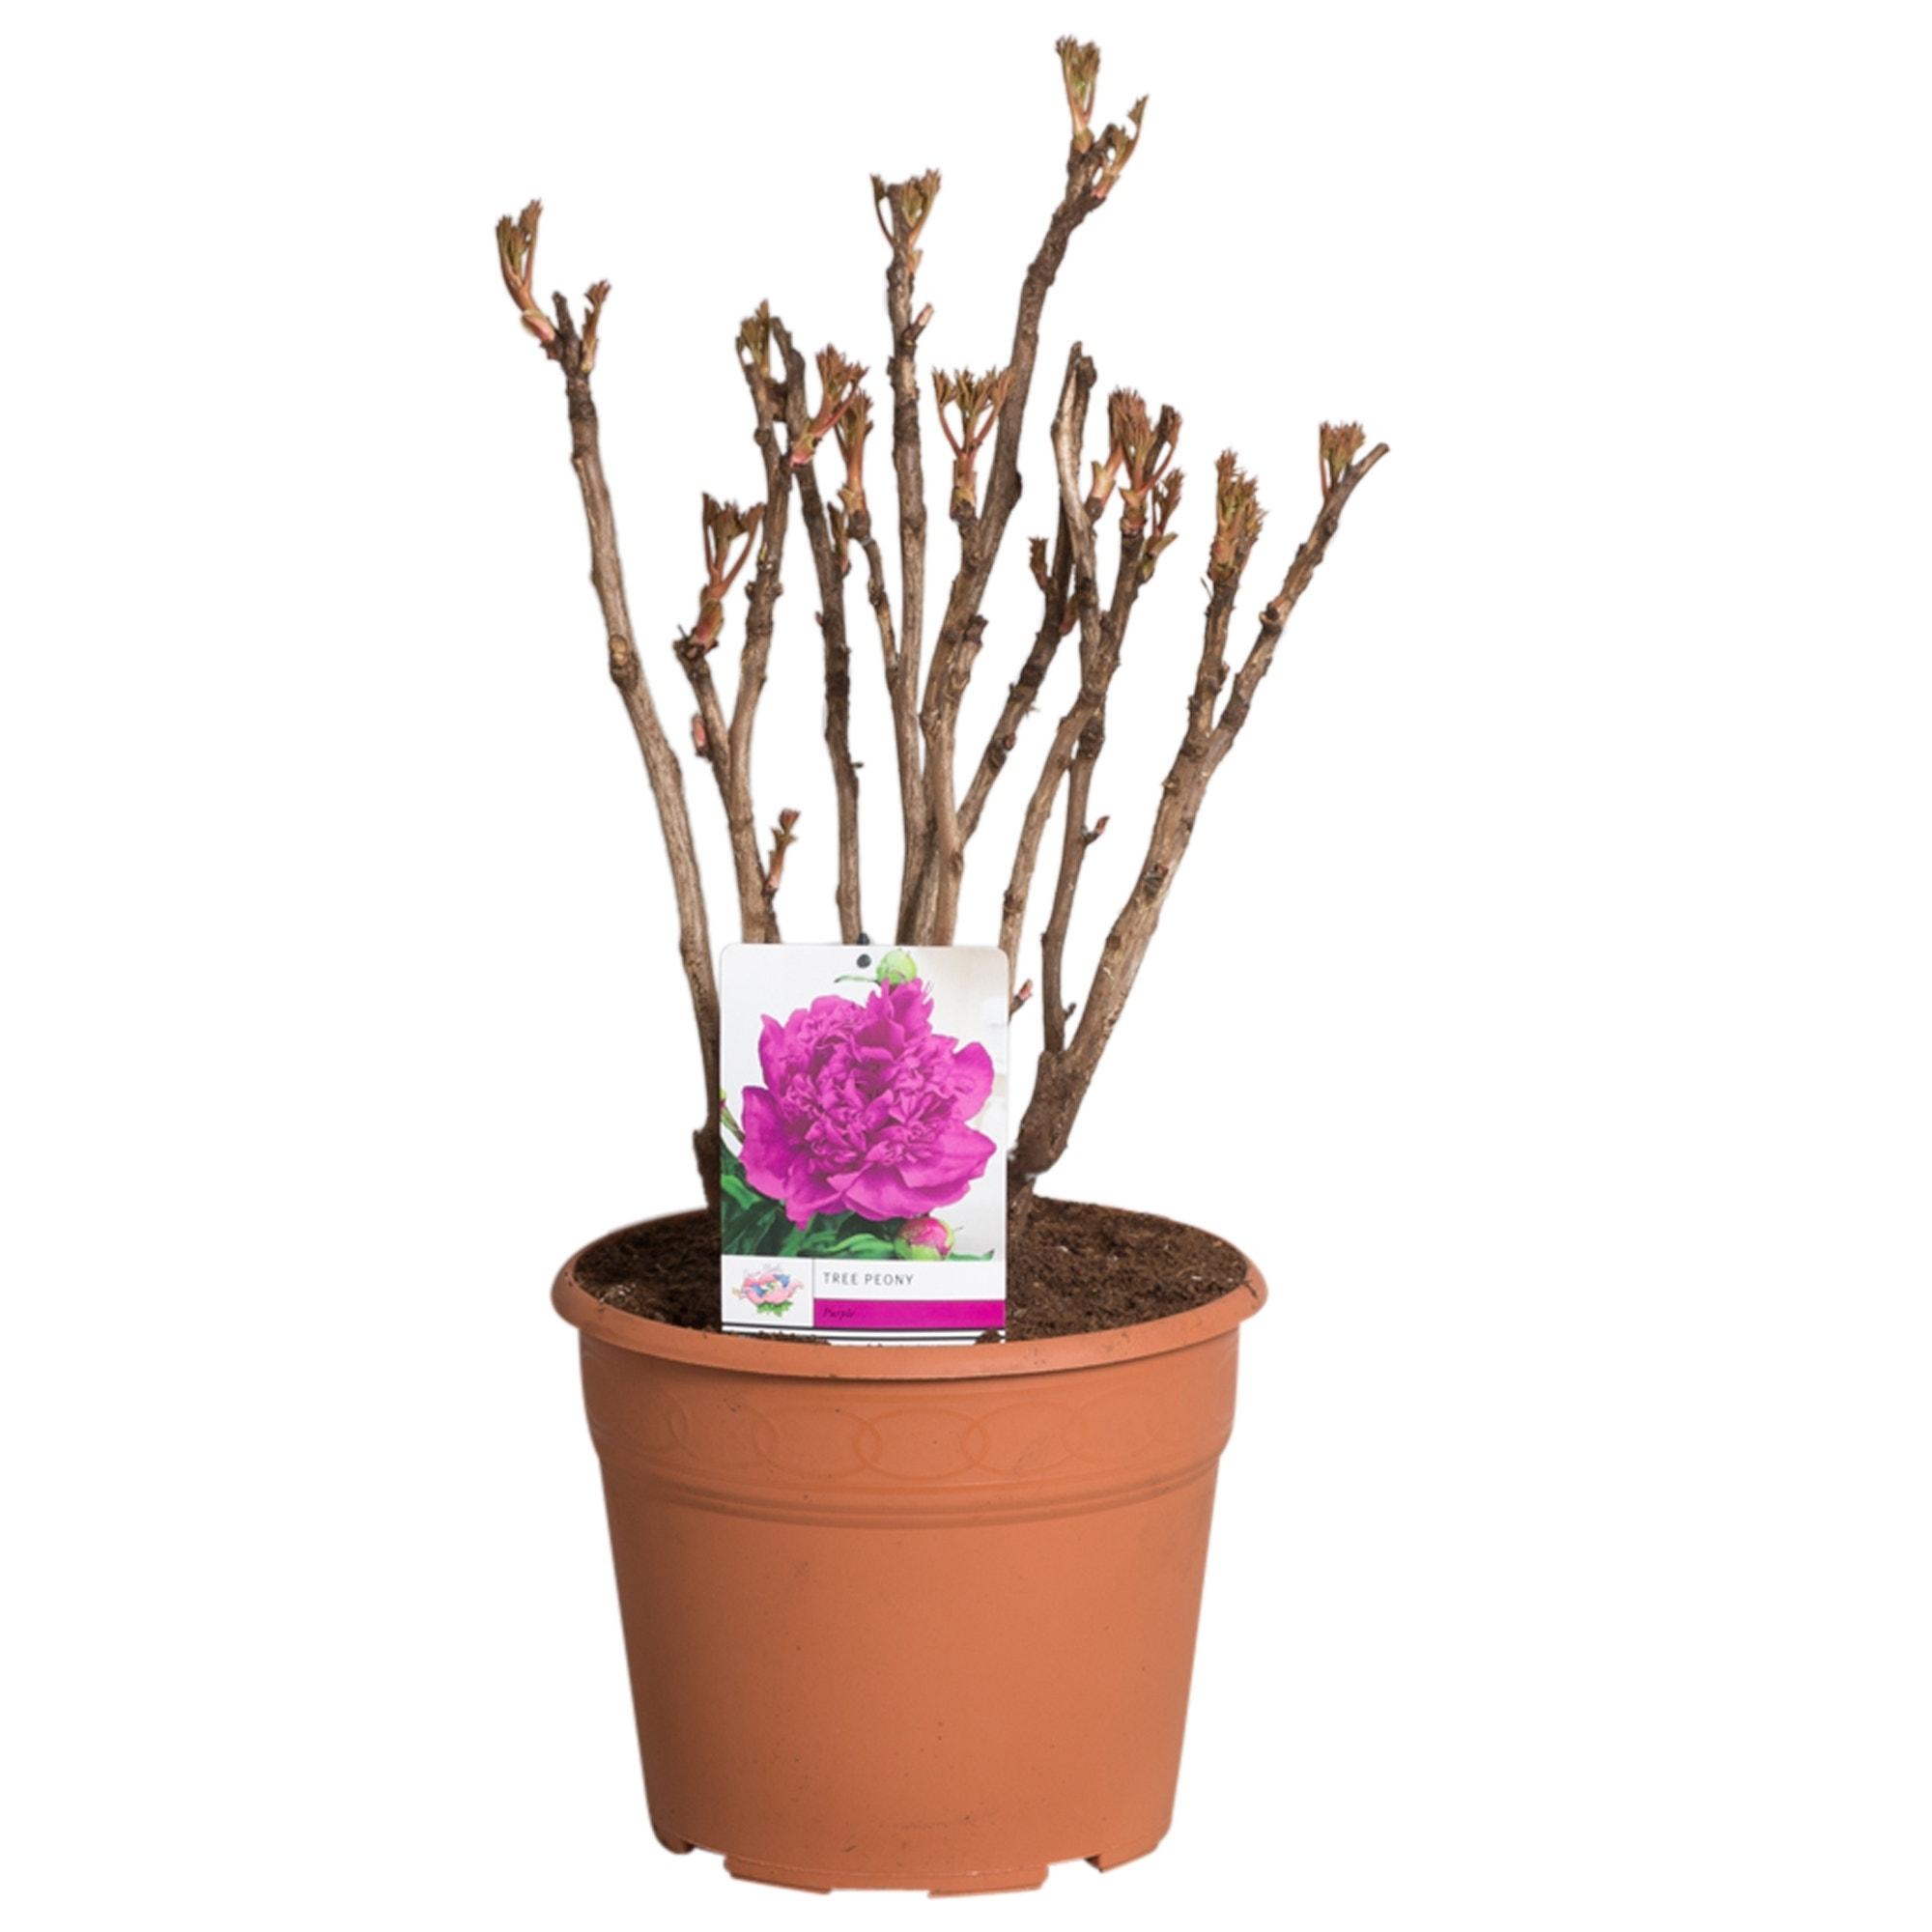 Paarse Boompioen (Paeonia suffruticosa)-Plant in pot-p11. Kleur: paars